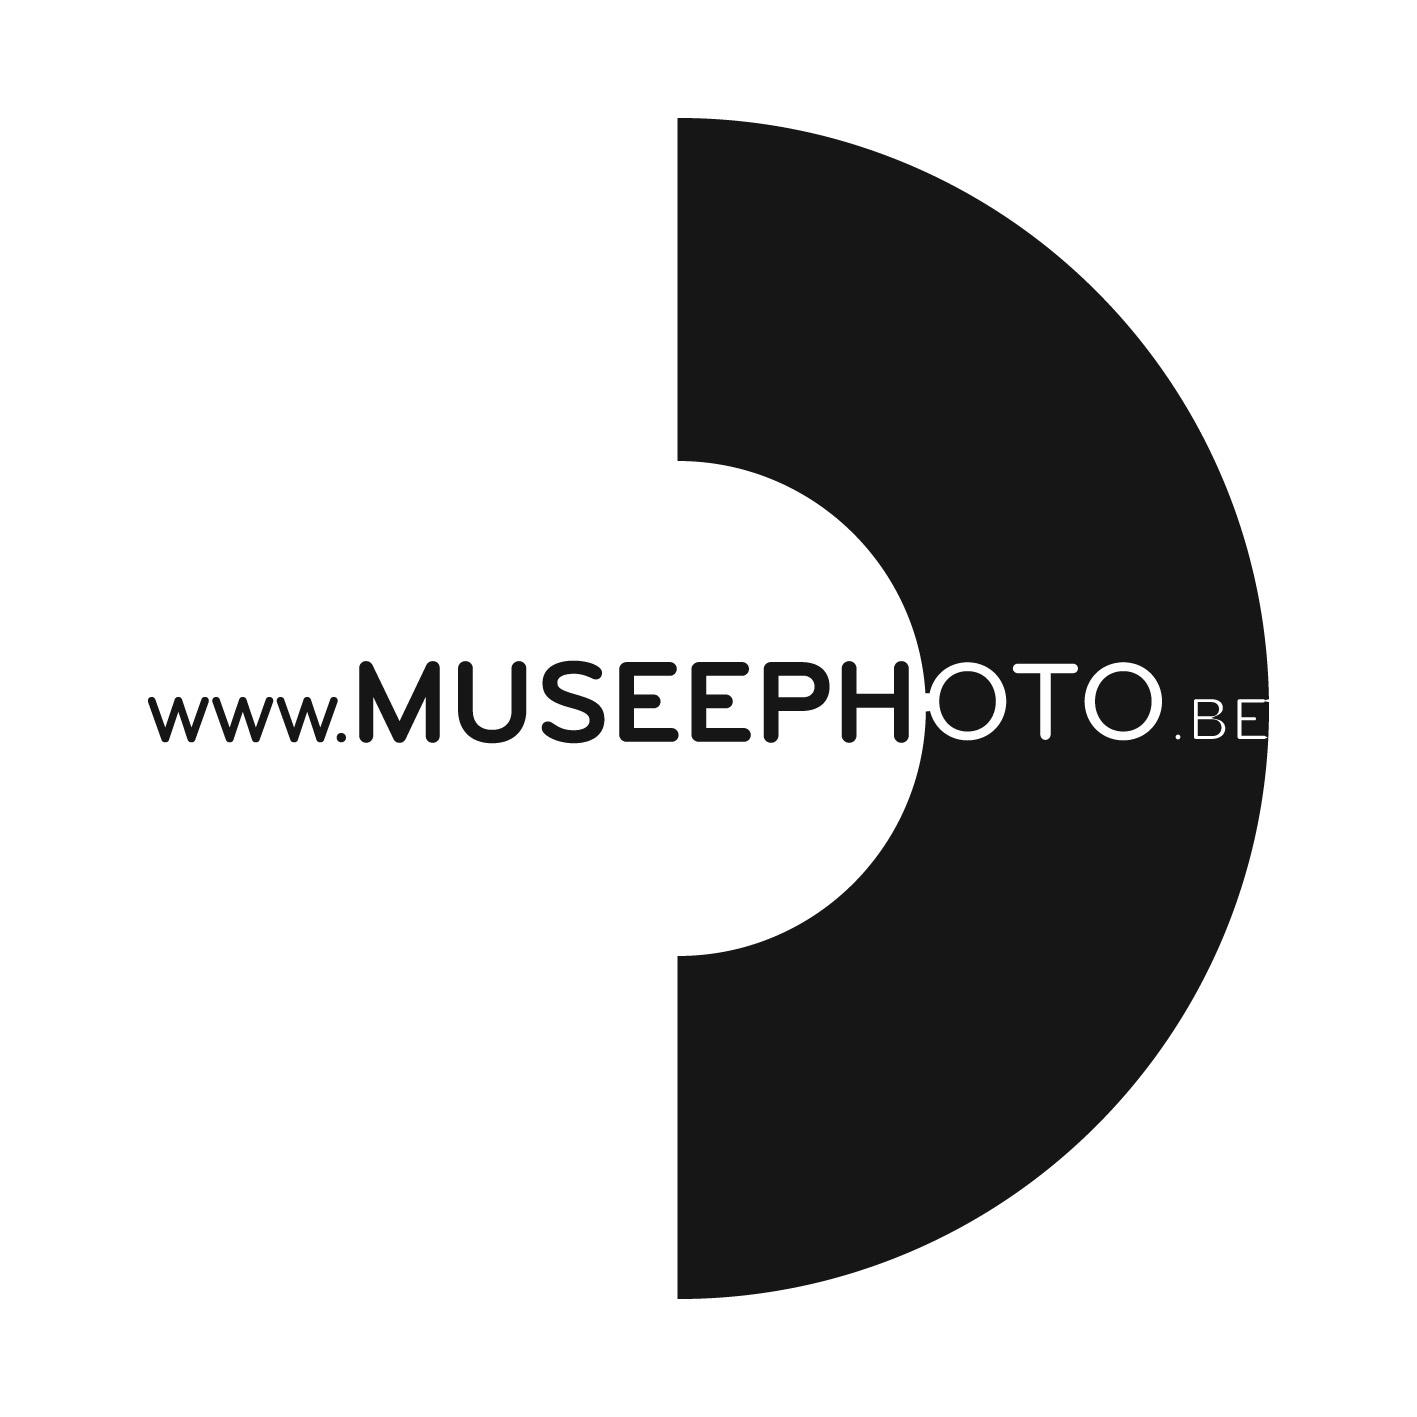 Museum der Fotografie